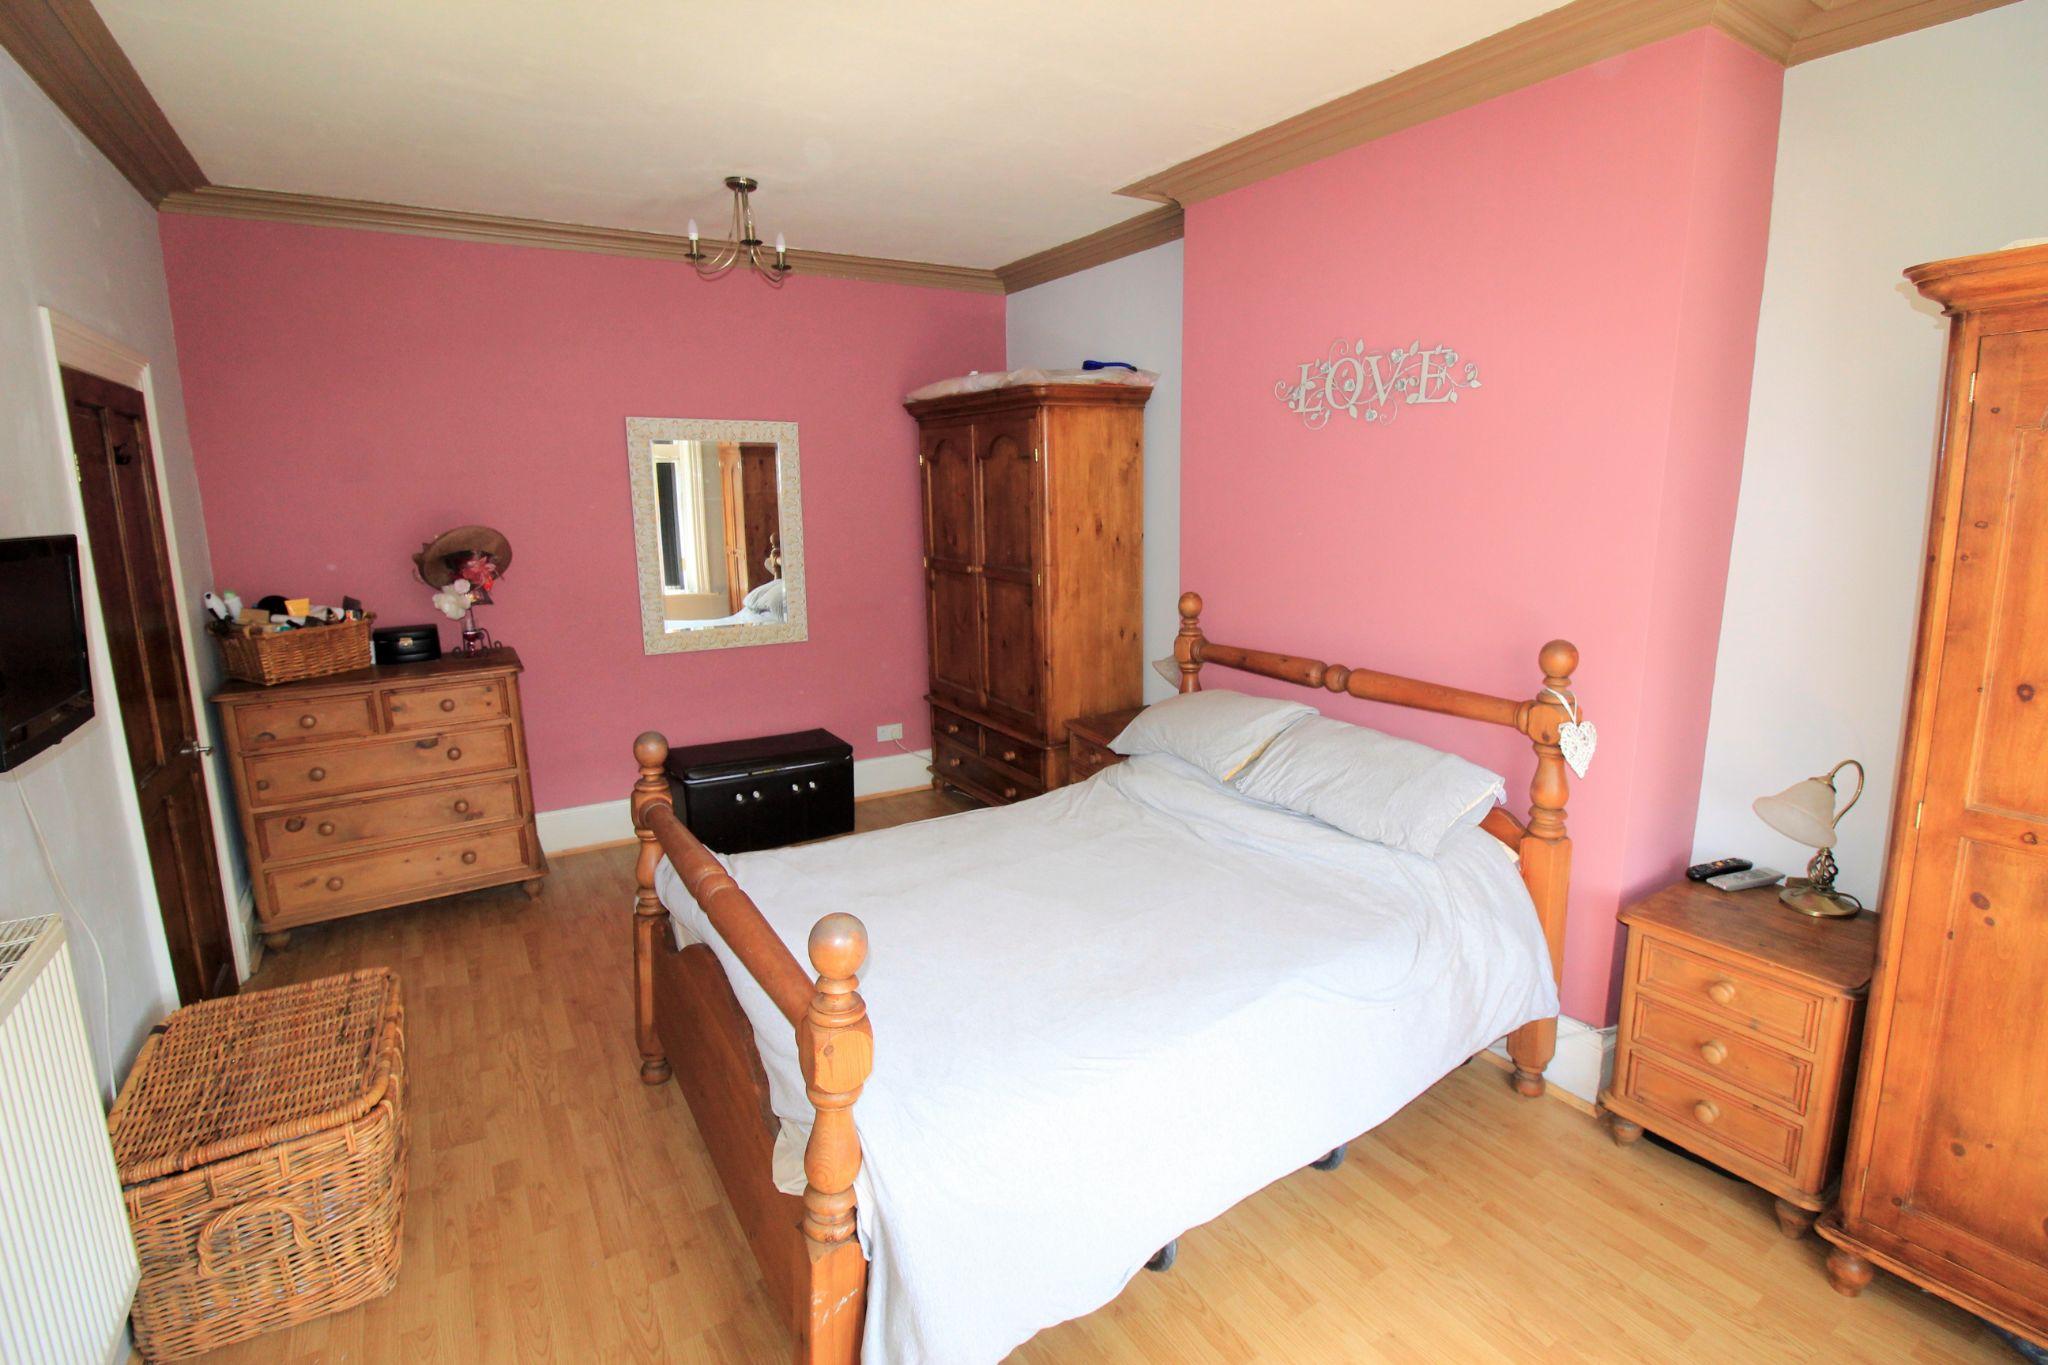 3 bedroom mid terraced house SSTC in Bradford - Bedroom 1